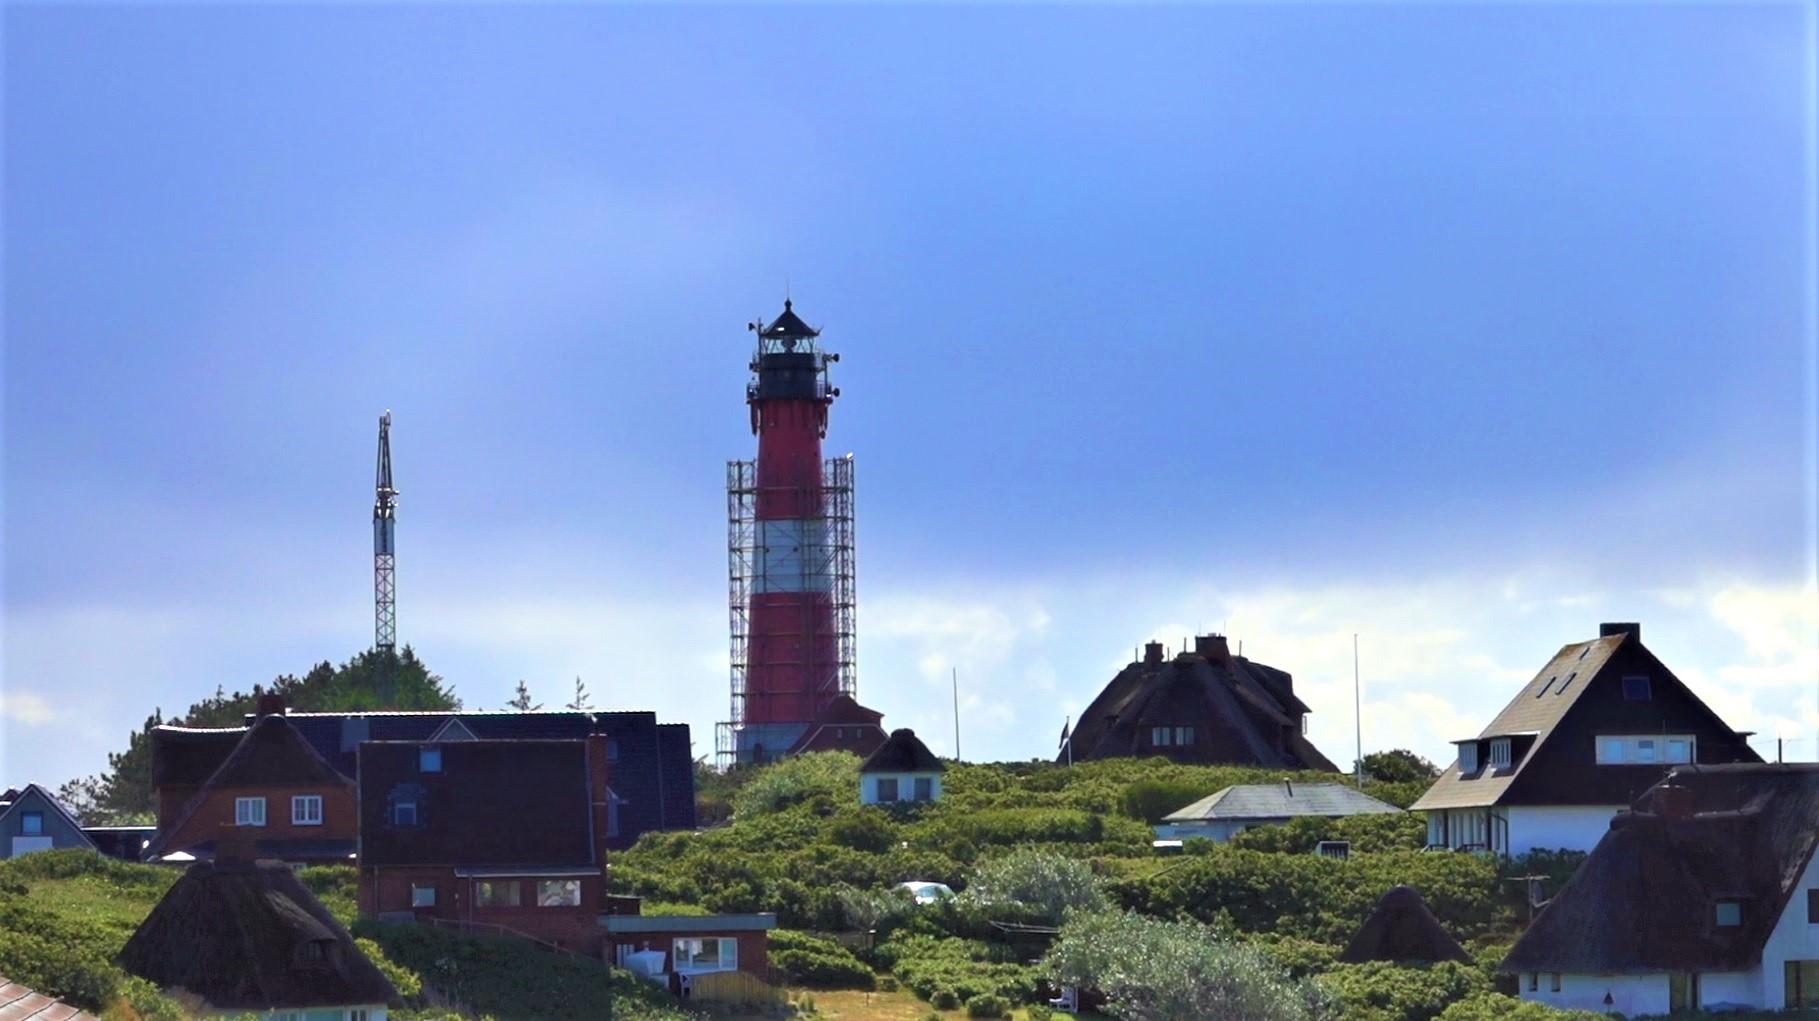 Sylts Mobilfunkempfang durch Leuchtturm-Sanierung beeinträchtigt